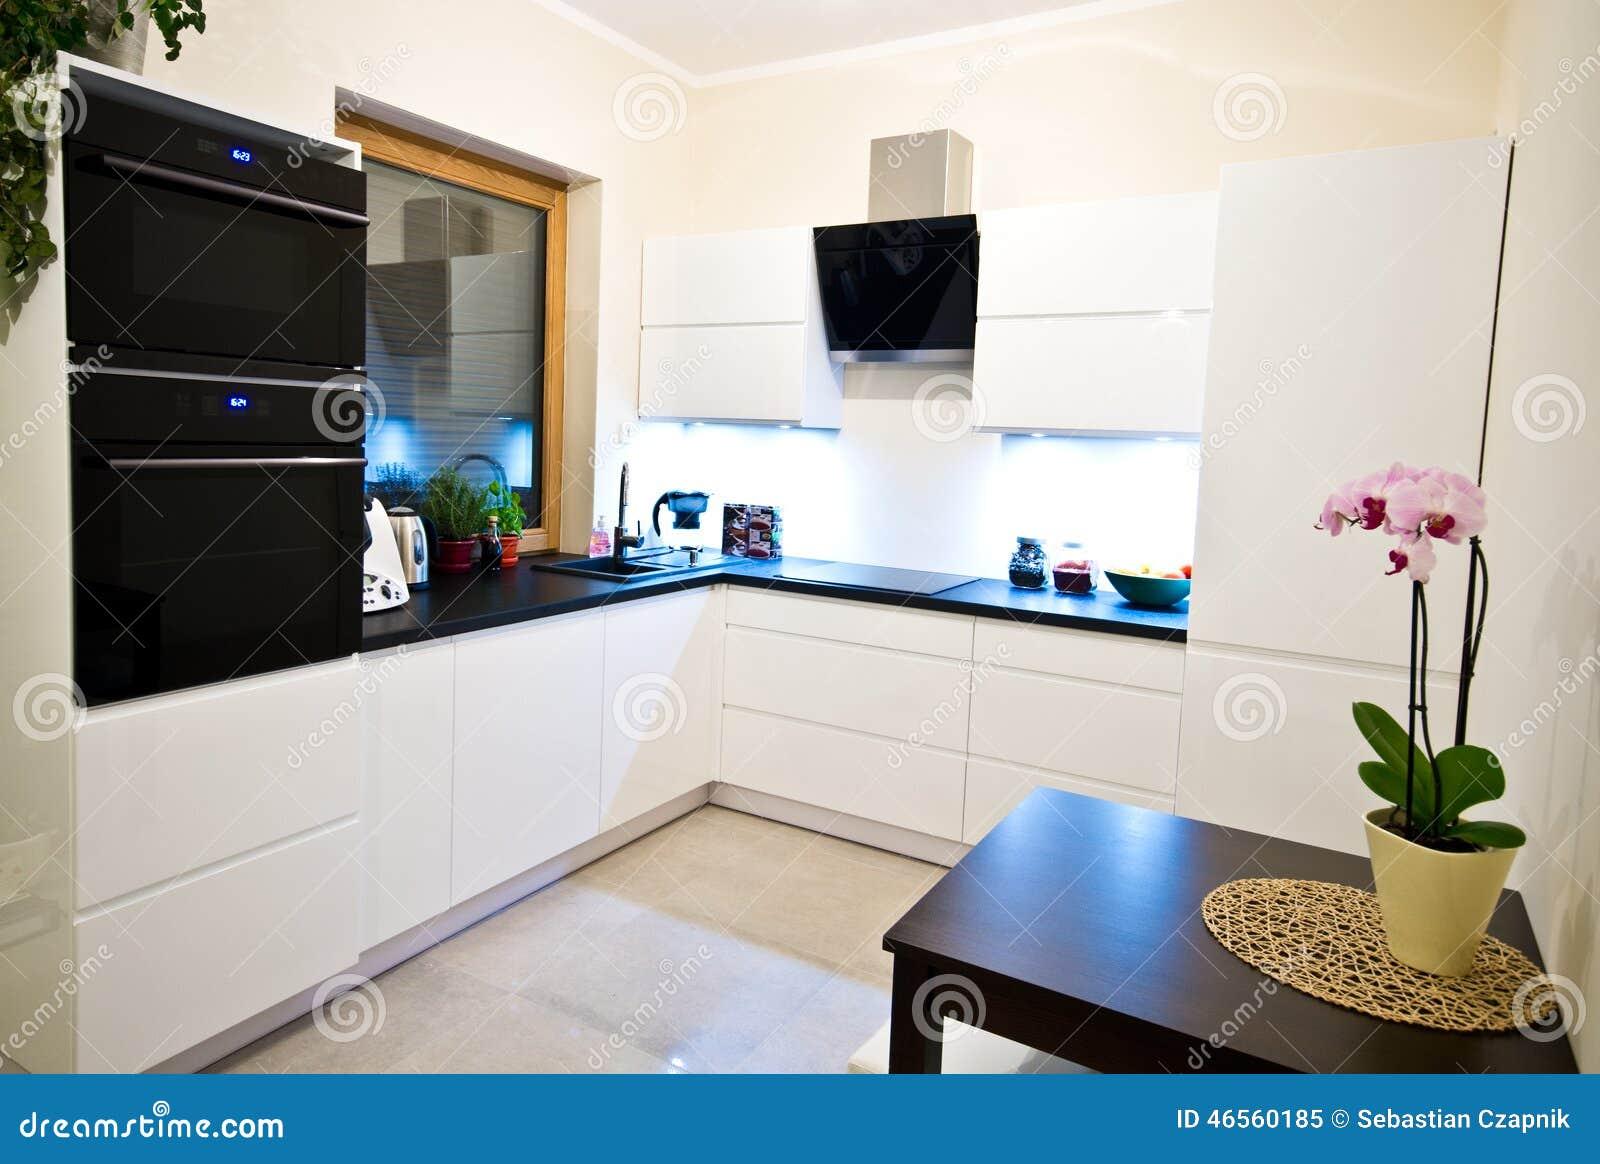 Modern kitchen in white stock photo image 46560185 - Kaplan furniture for elegant home interior ...